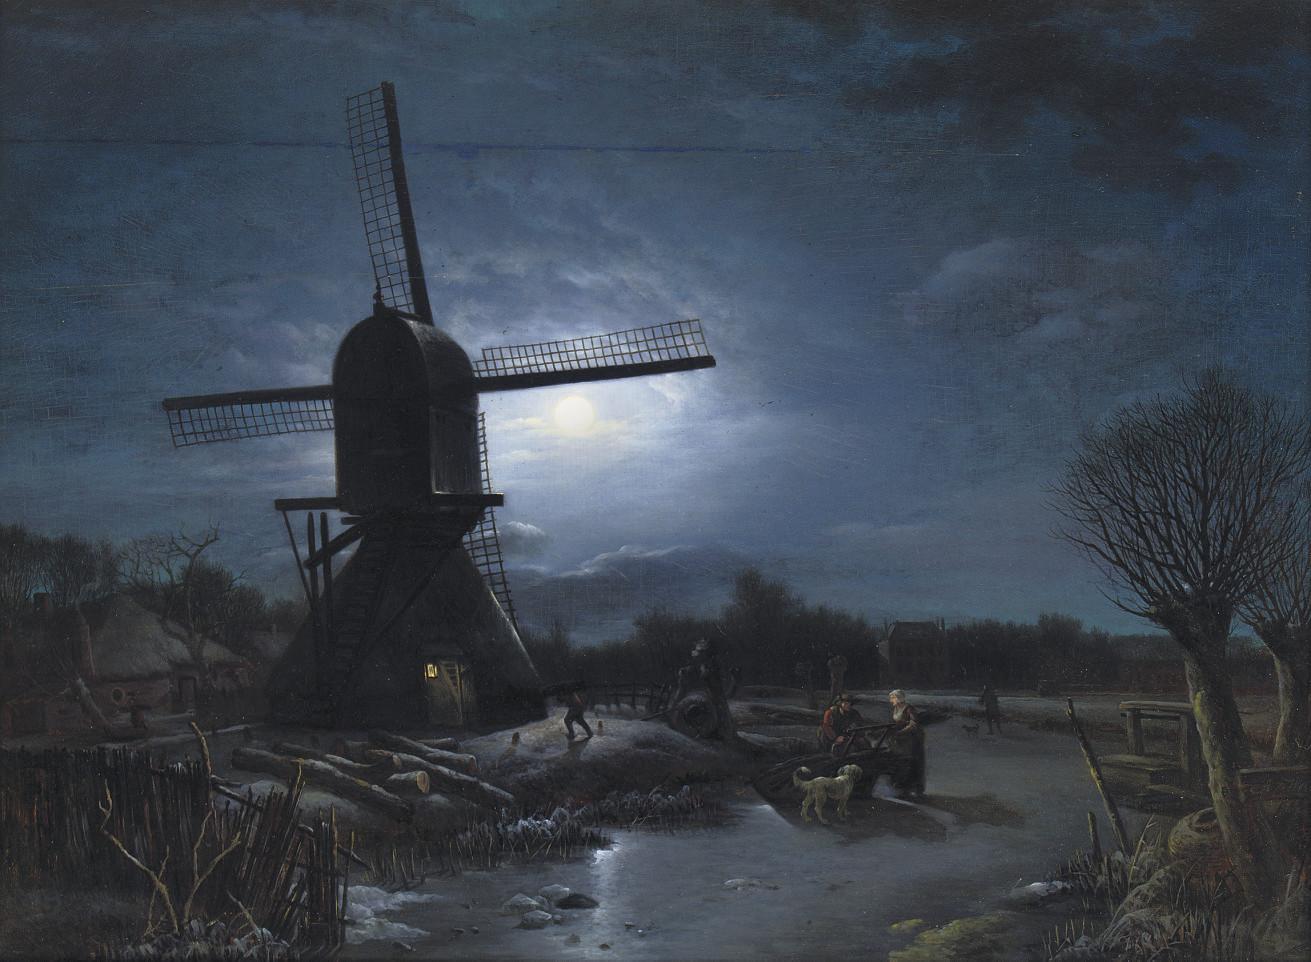 Activities near a windmill at night